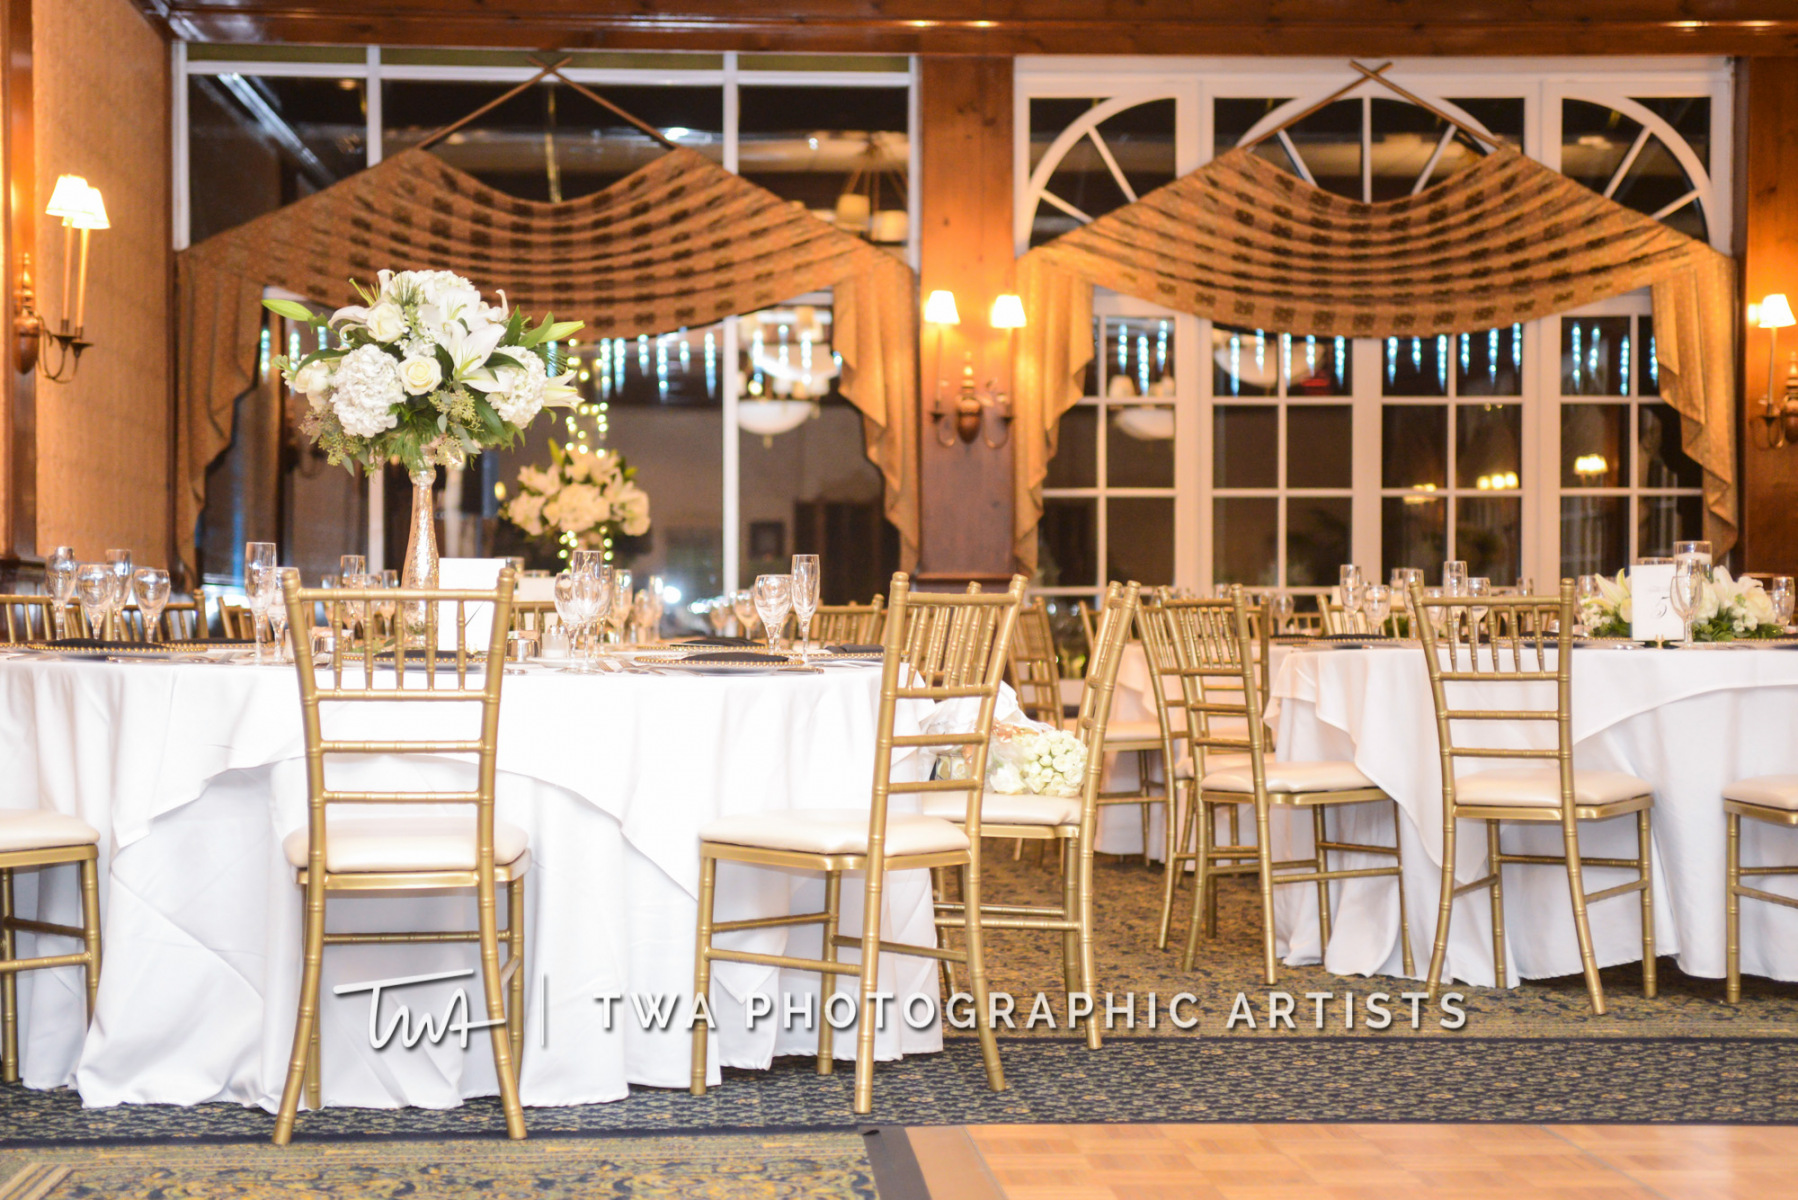 Chicago-Wedding-Photographer-TWA-Photographic-Artists-Drake-Oak-Brook_Bartlett_Najac_TL_CM-1598